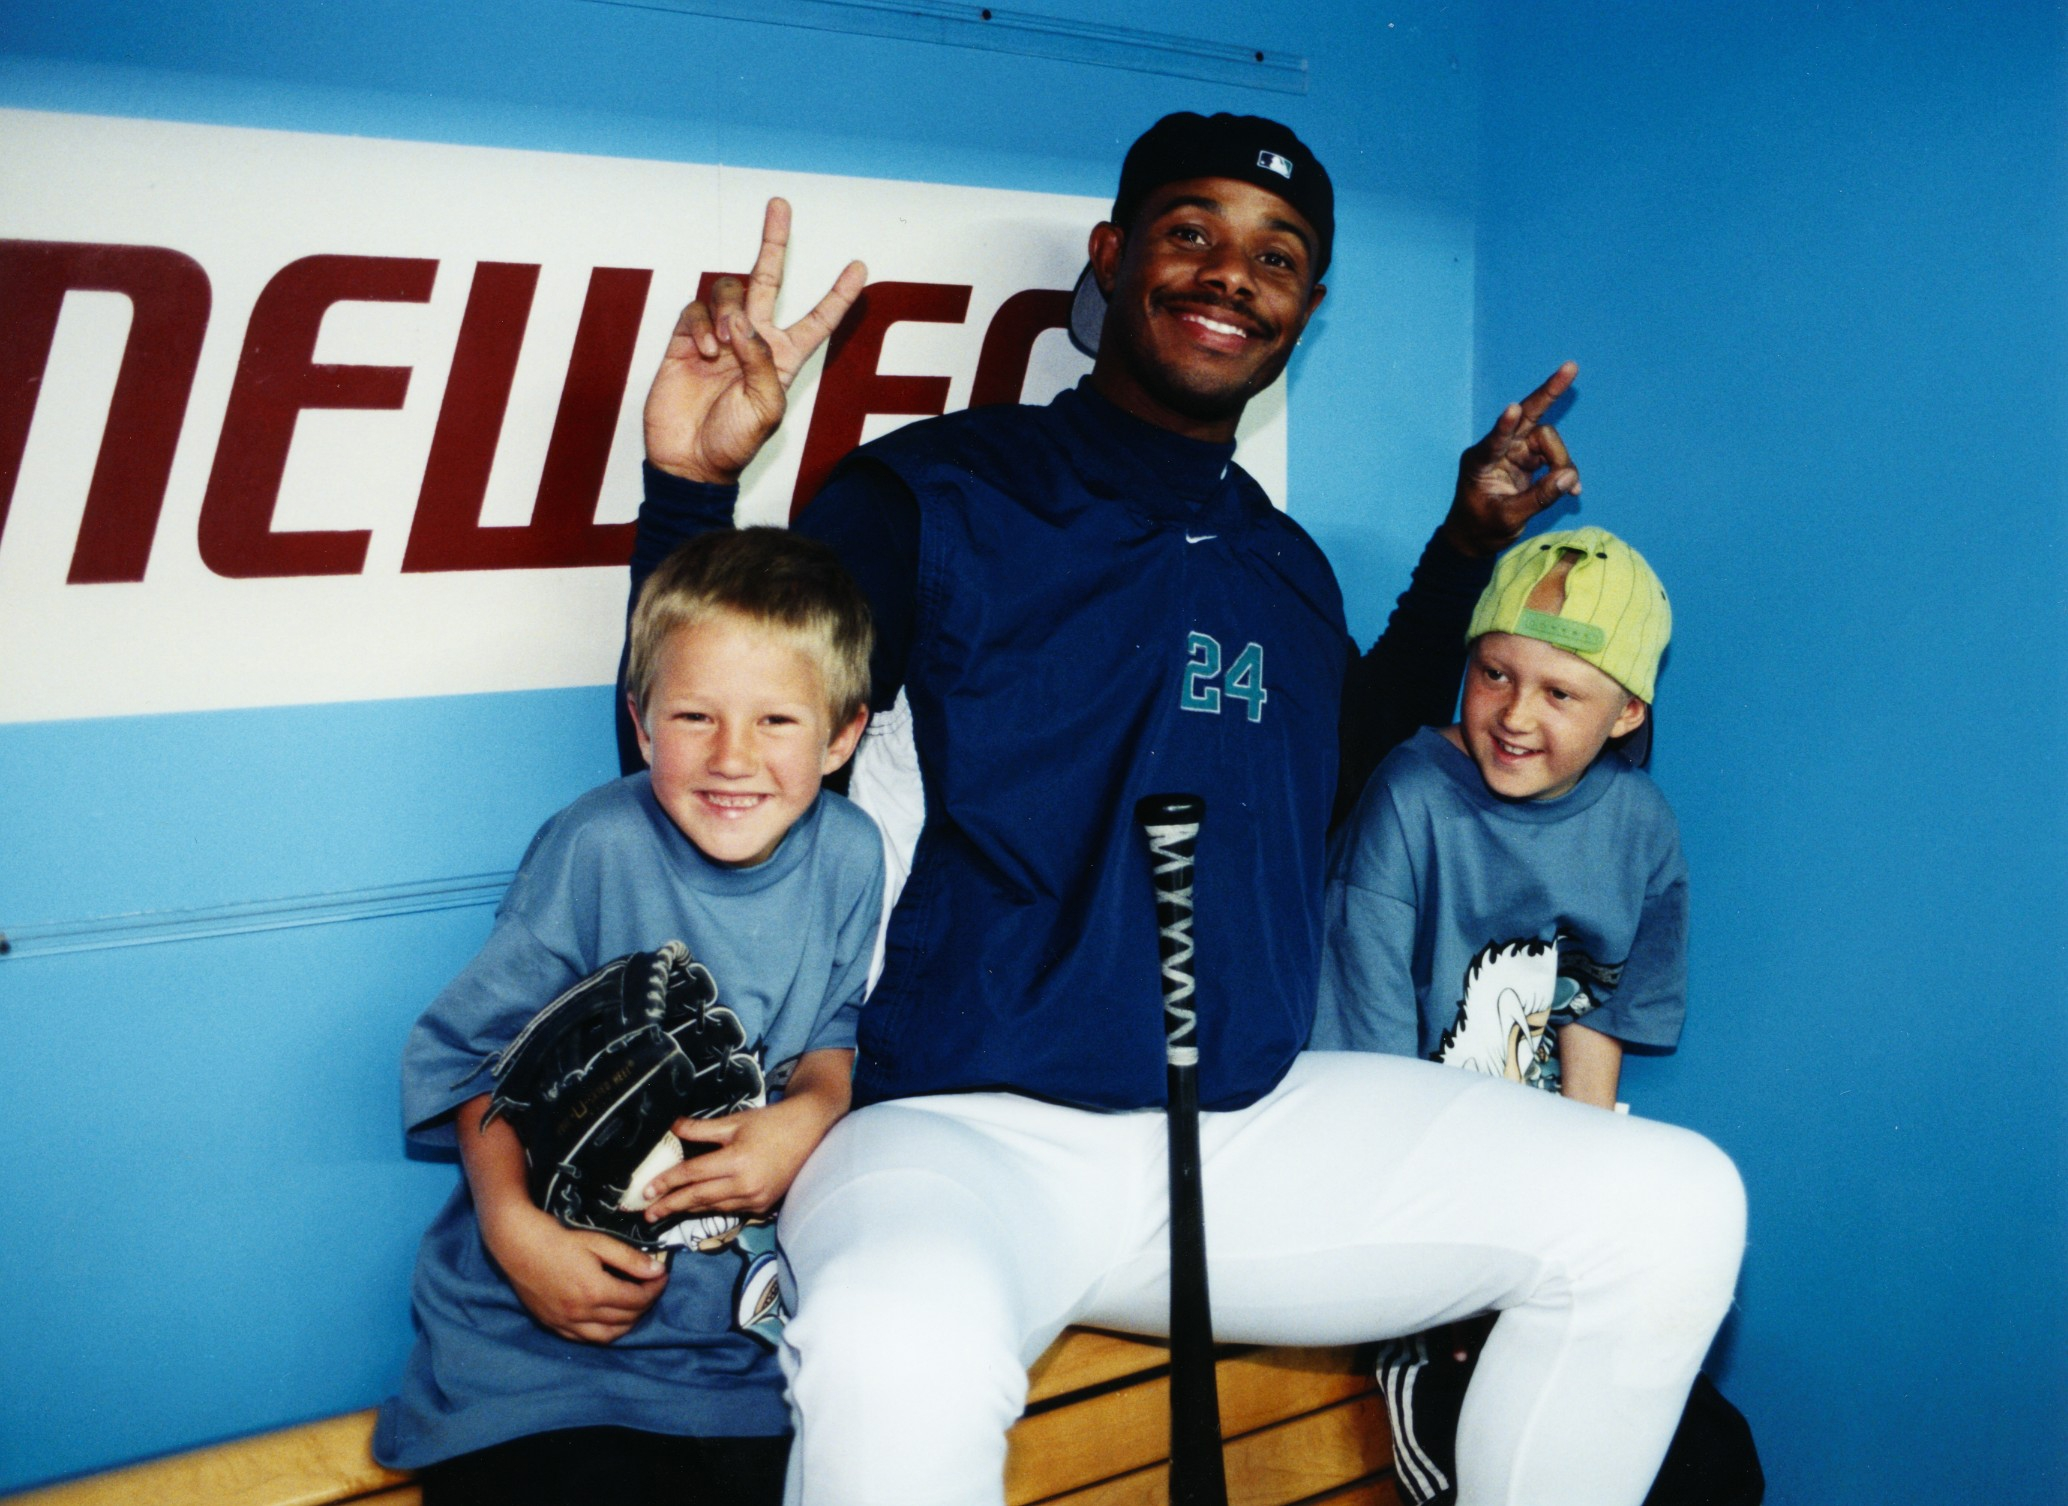 Signed Ken Griffey Jr. bat